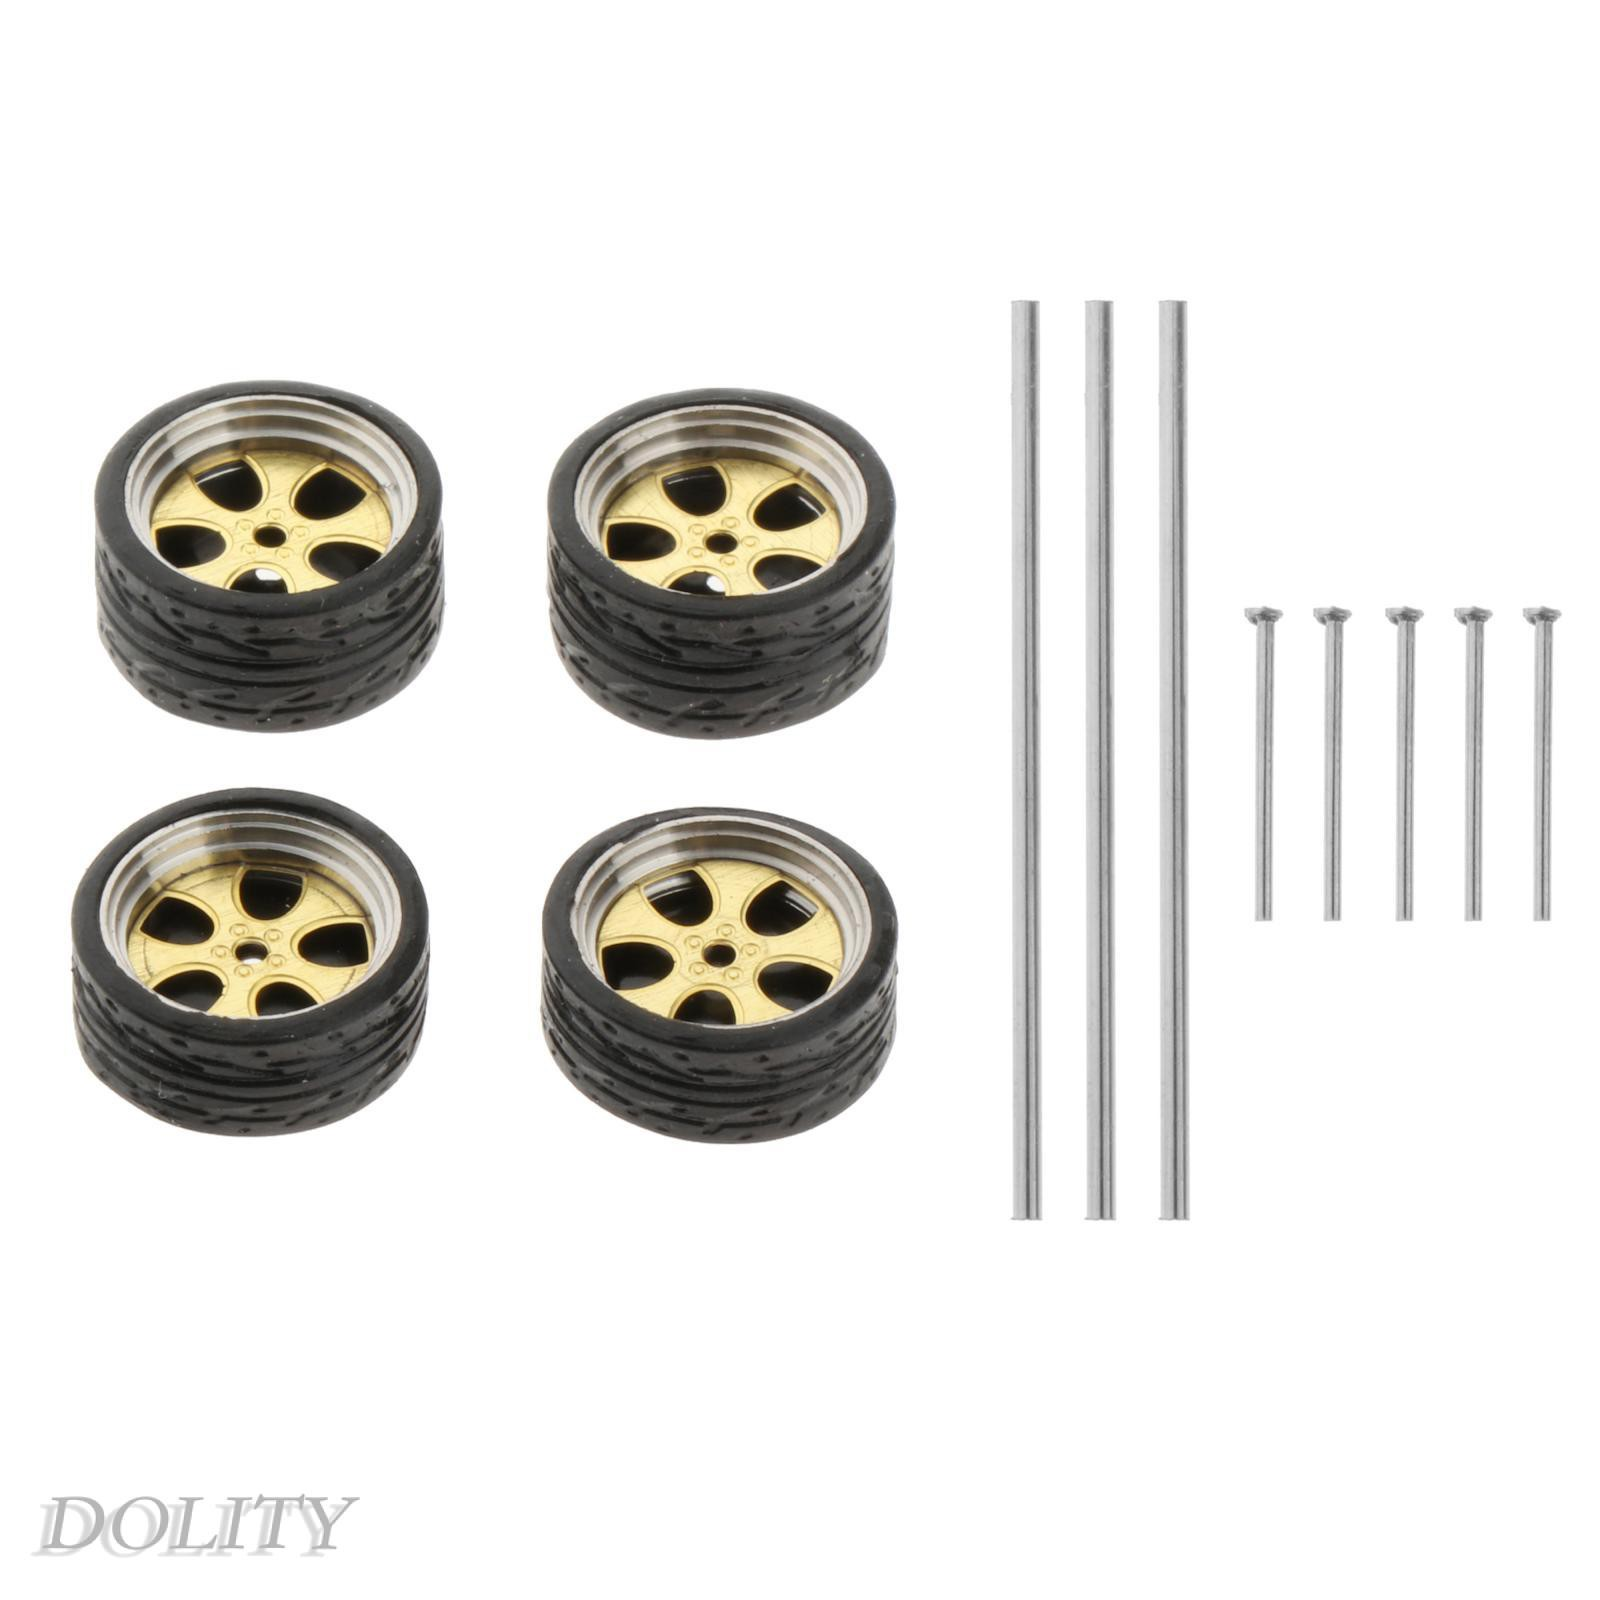 [Dolity] 1: 64 比例壓鑄賽車模型車輪和輪胎套裝配件風格 A